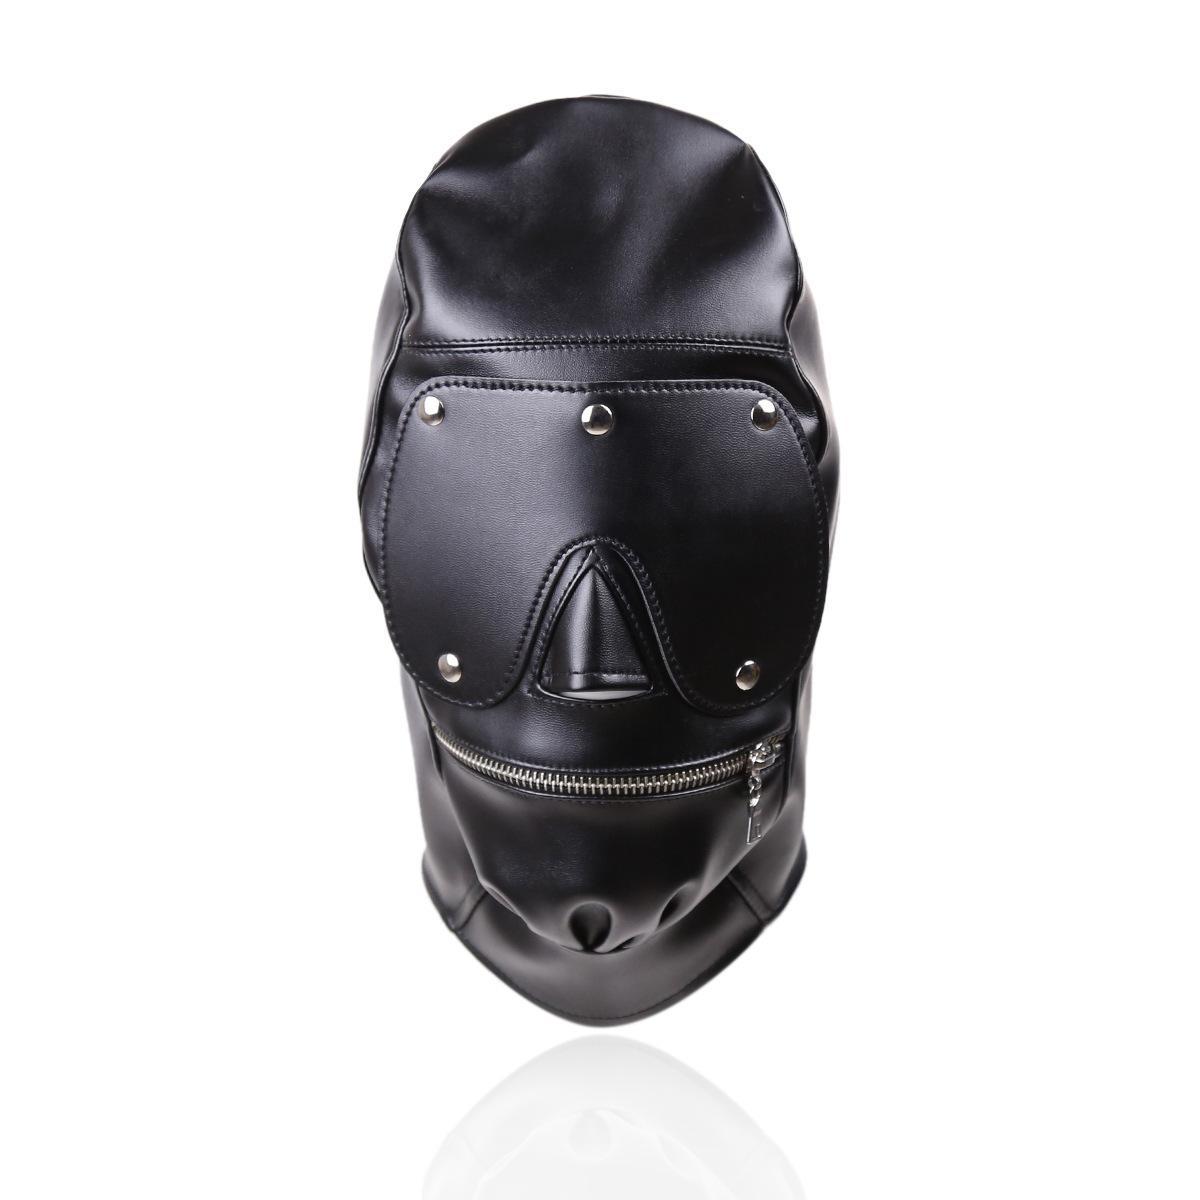 SM Eye Mask Fetish Leather Open Mouth Hood Ball Gag Bondage Erotic For Couple Men Women Adult Game Sex Product Toy T200410